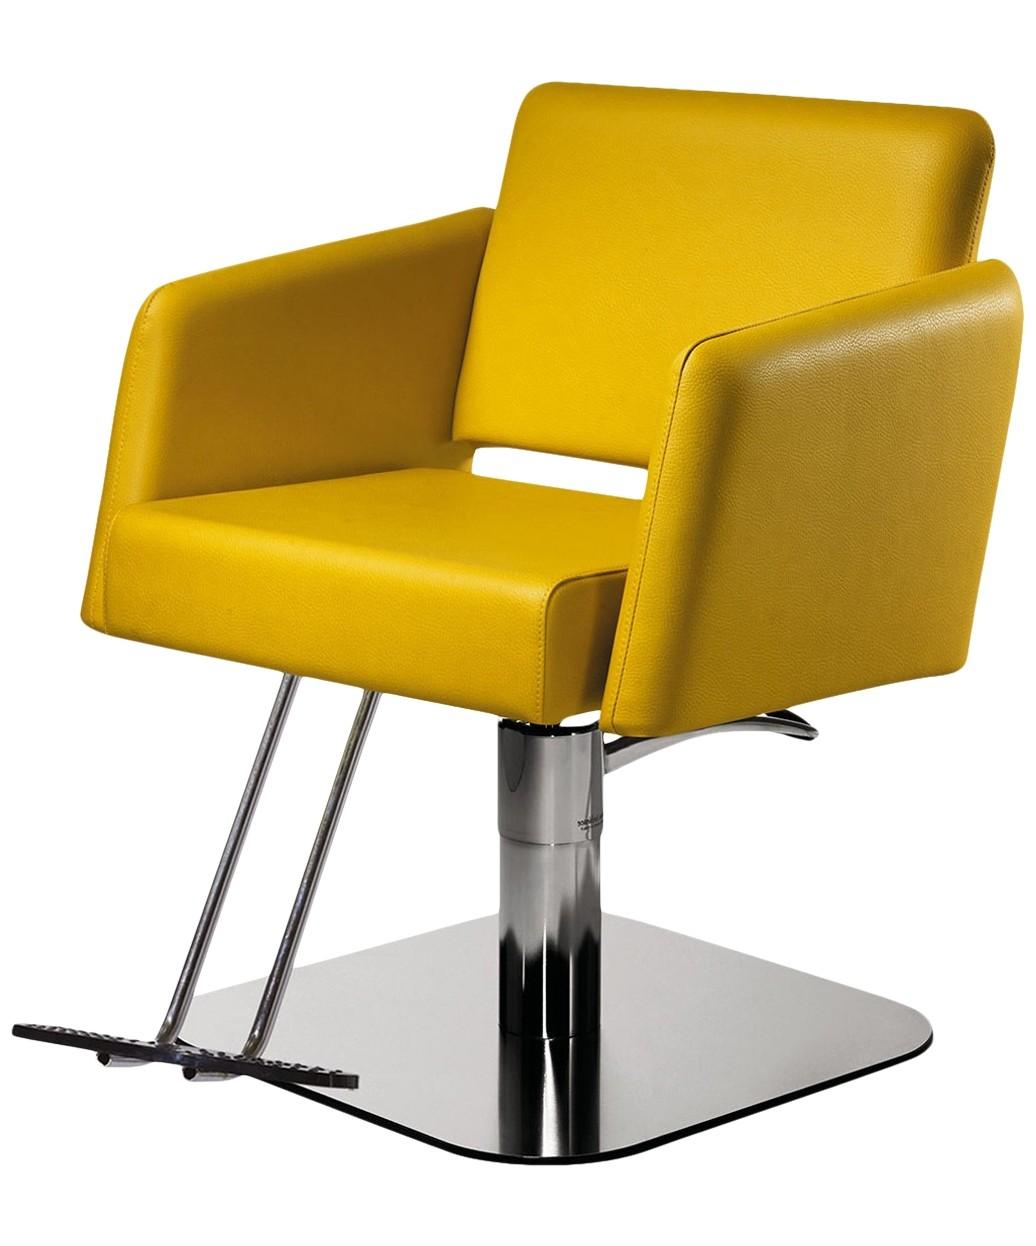 Salon Ambience SH-325 Kite Styling Chair